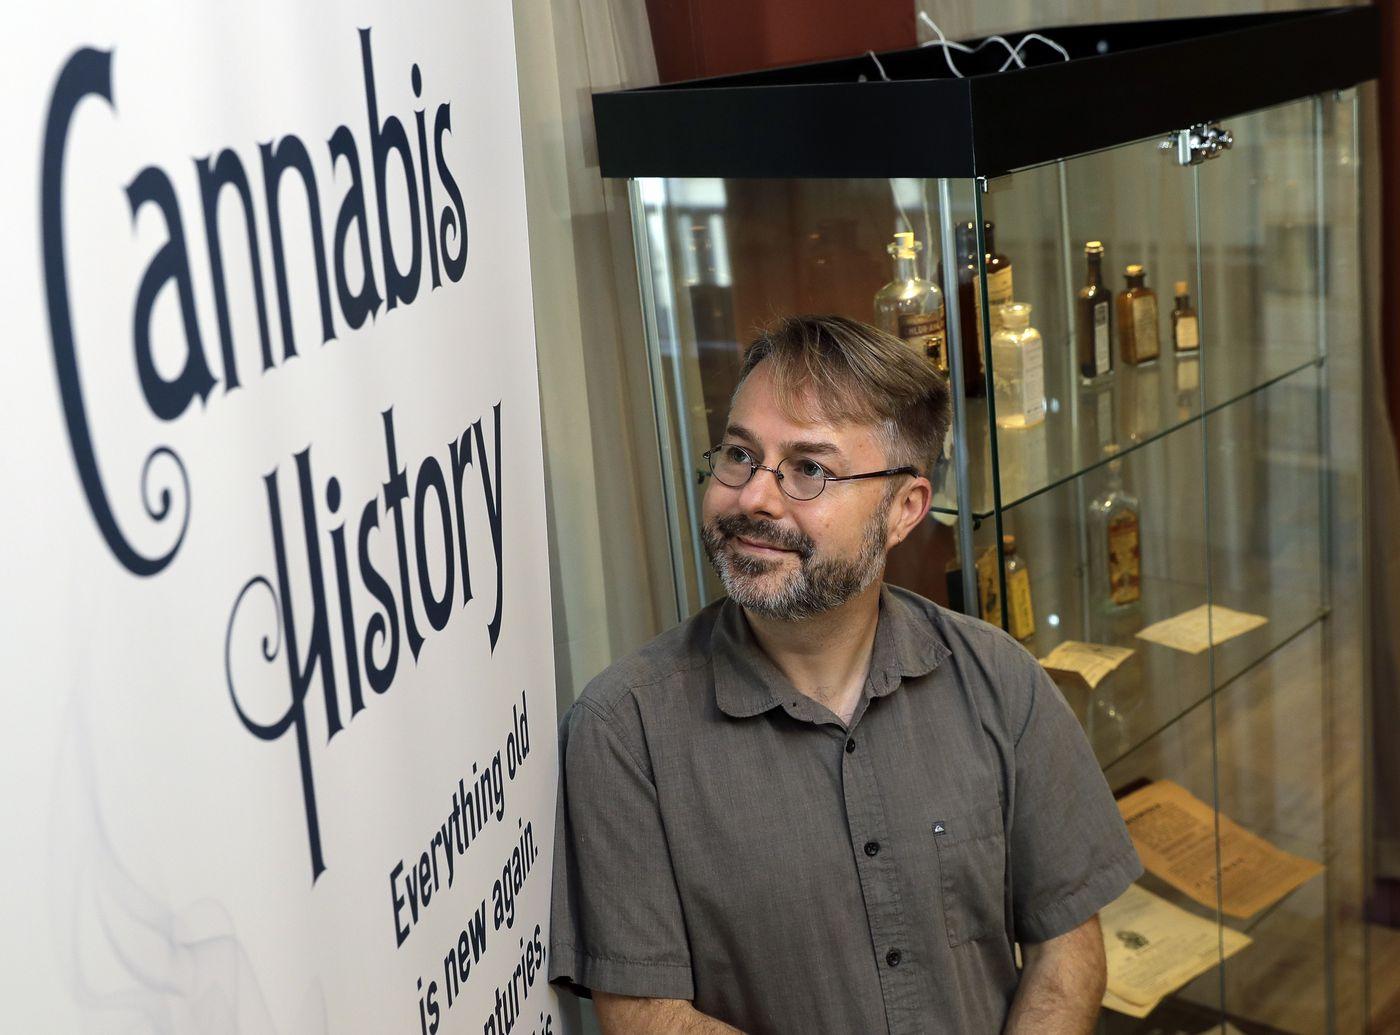 Toke off! Marijuana is set to become legal across Canada